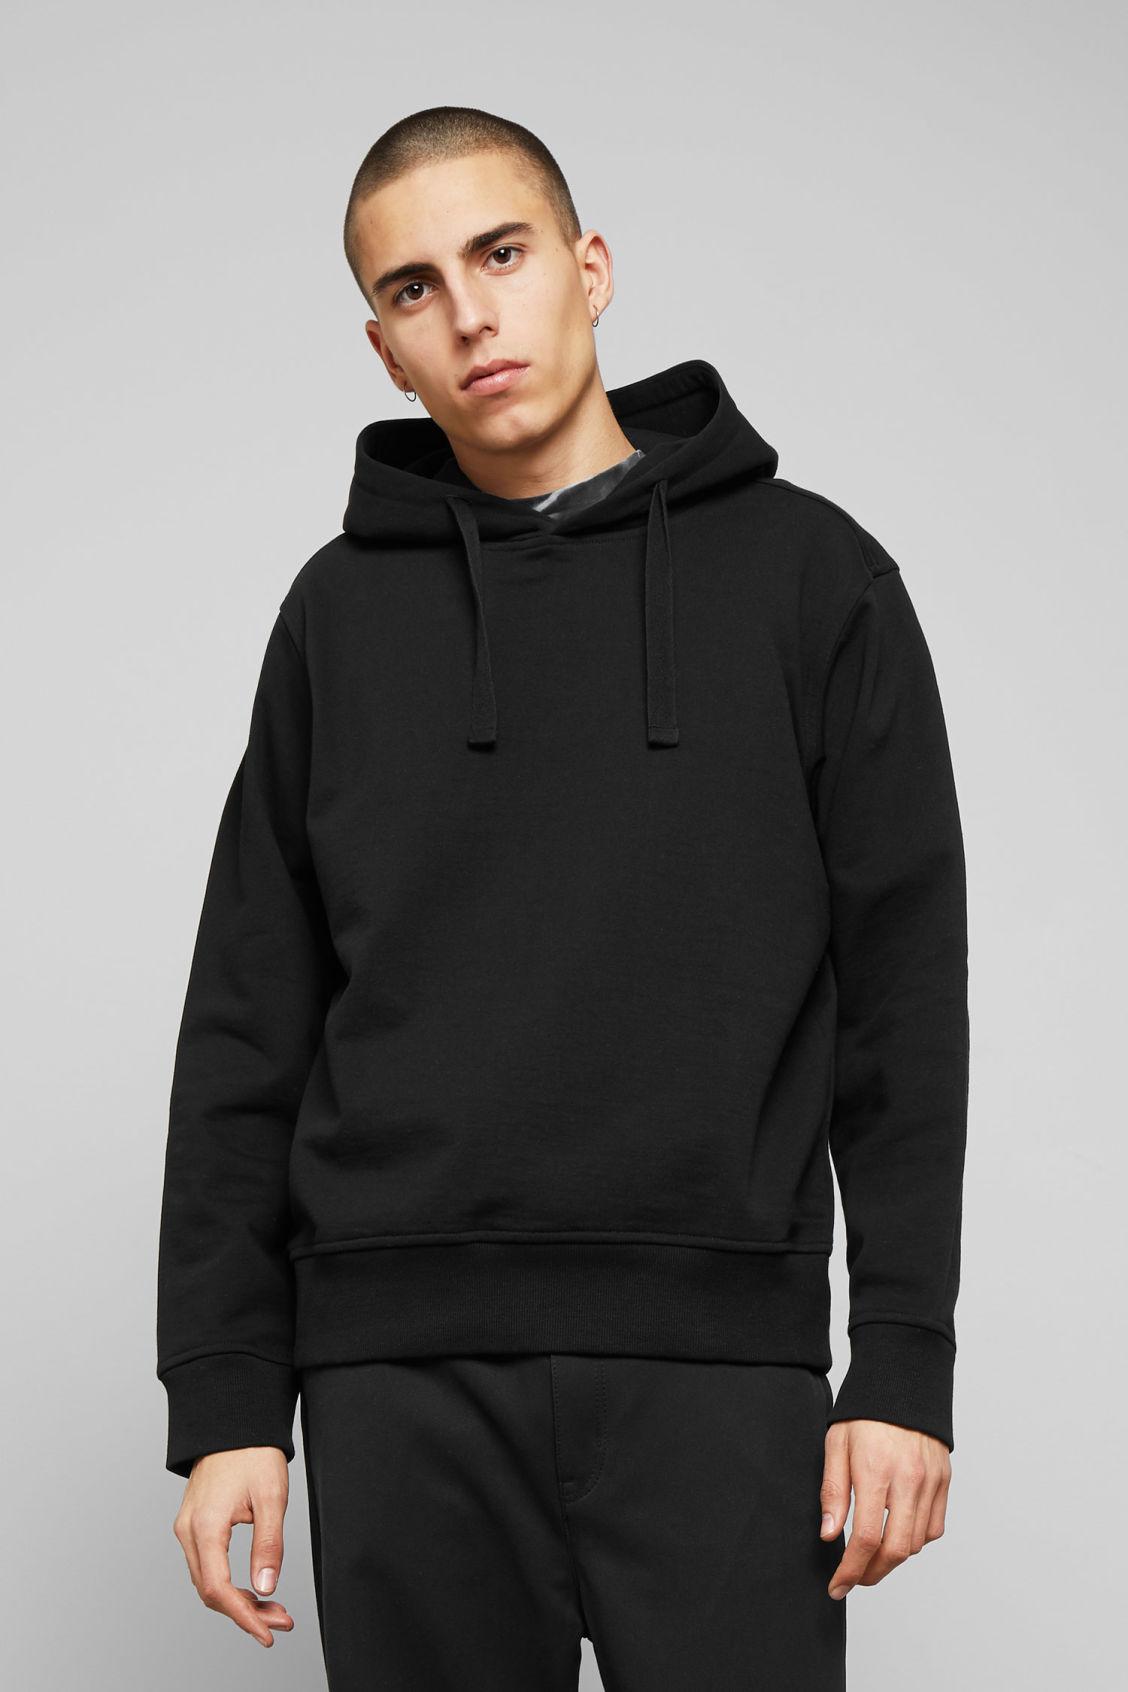 69d7e2f5470f Hadi Hoodie - Black - Hoodies   sweatshirts - Weekday